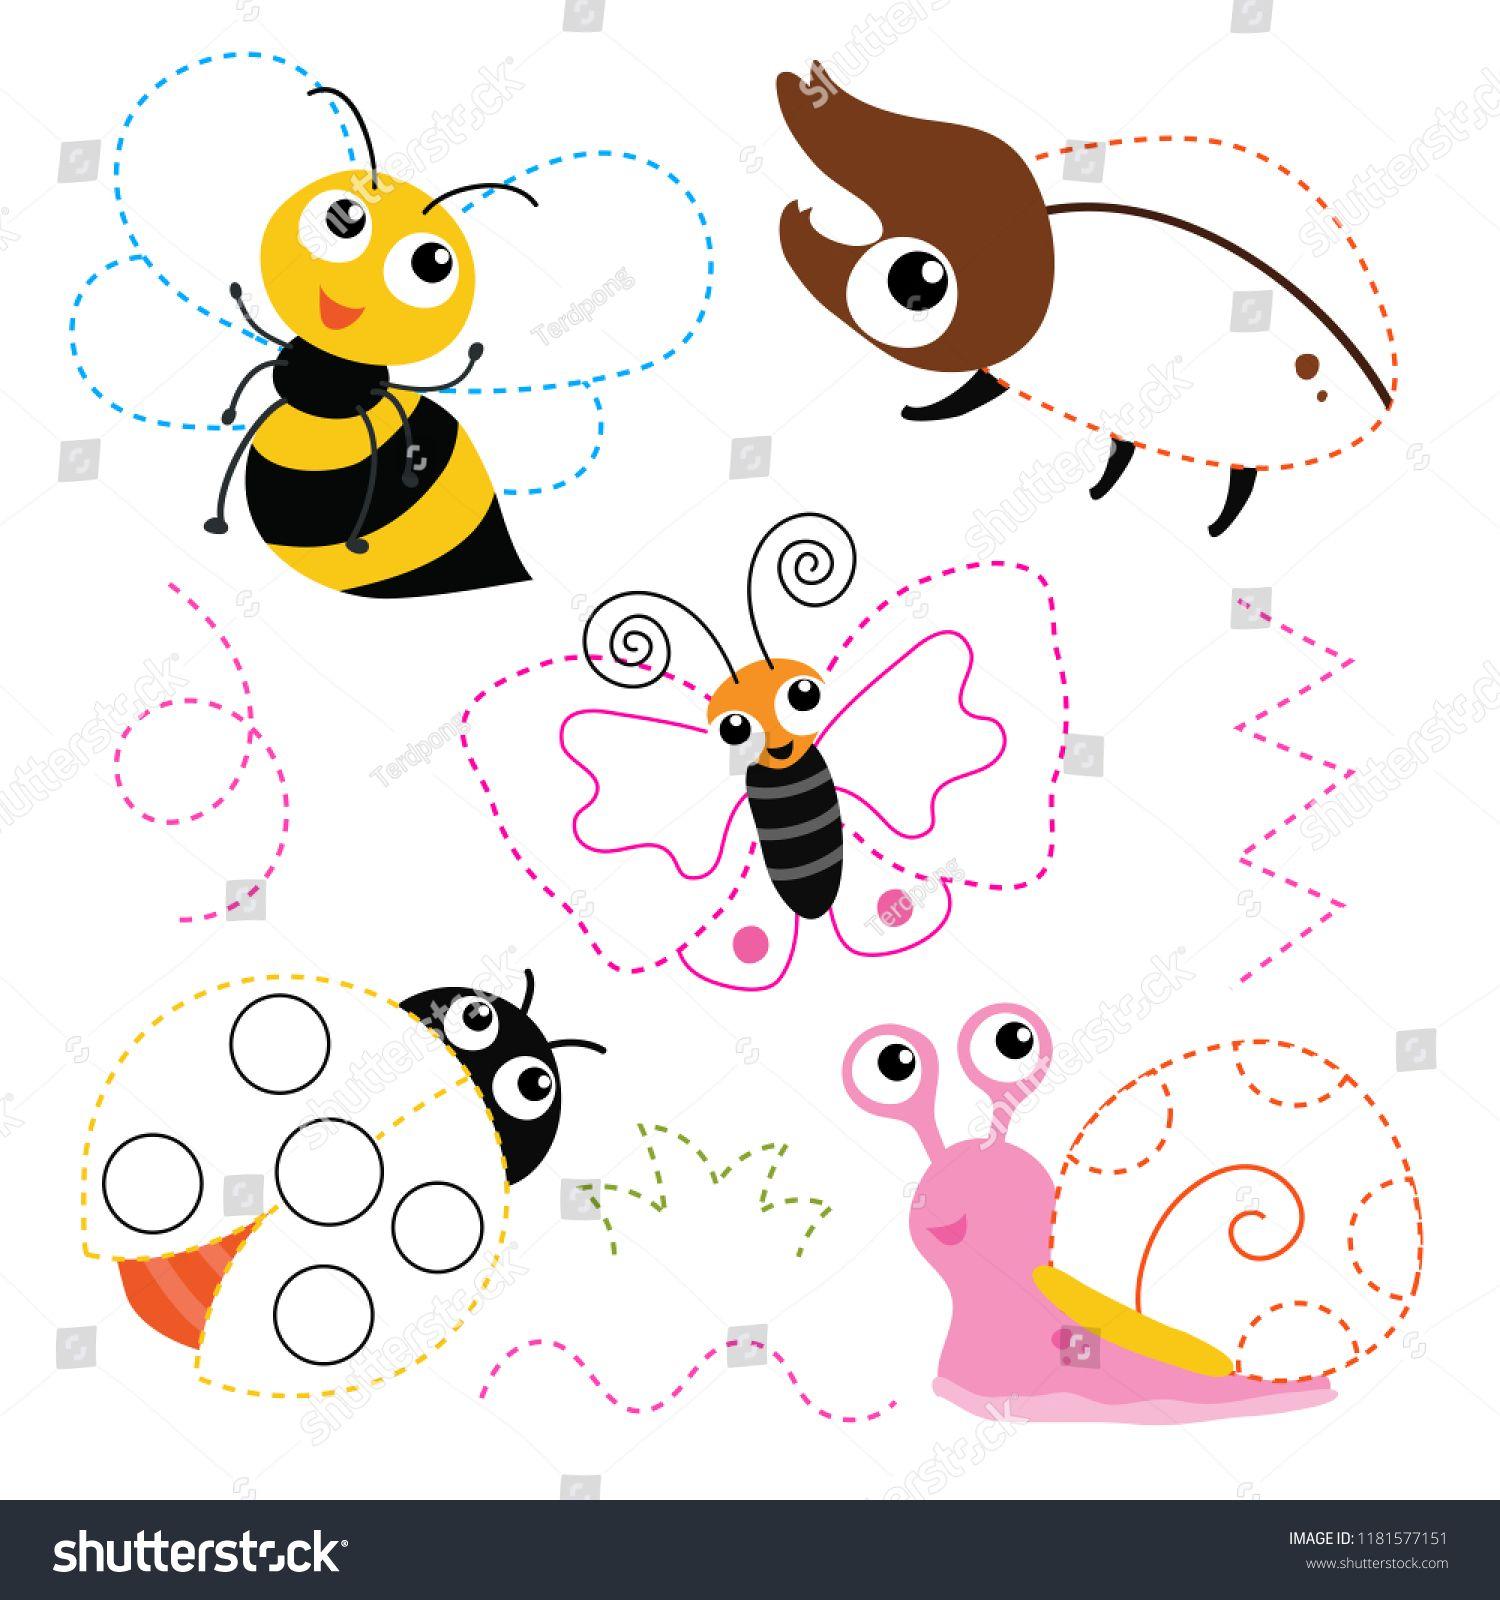 Worksheet Vector Design For Kid Artwork Vector Design For